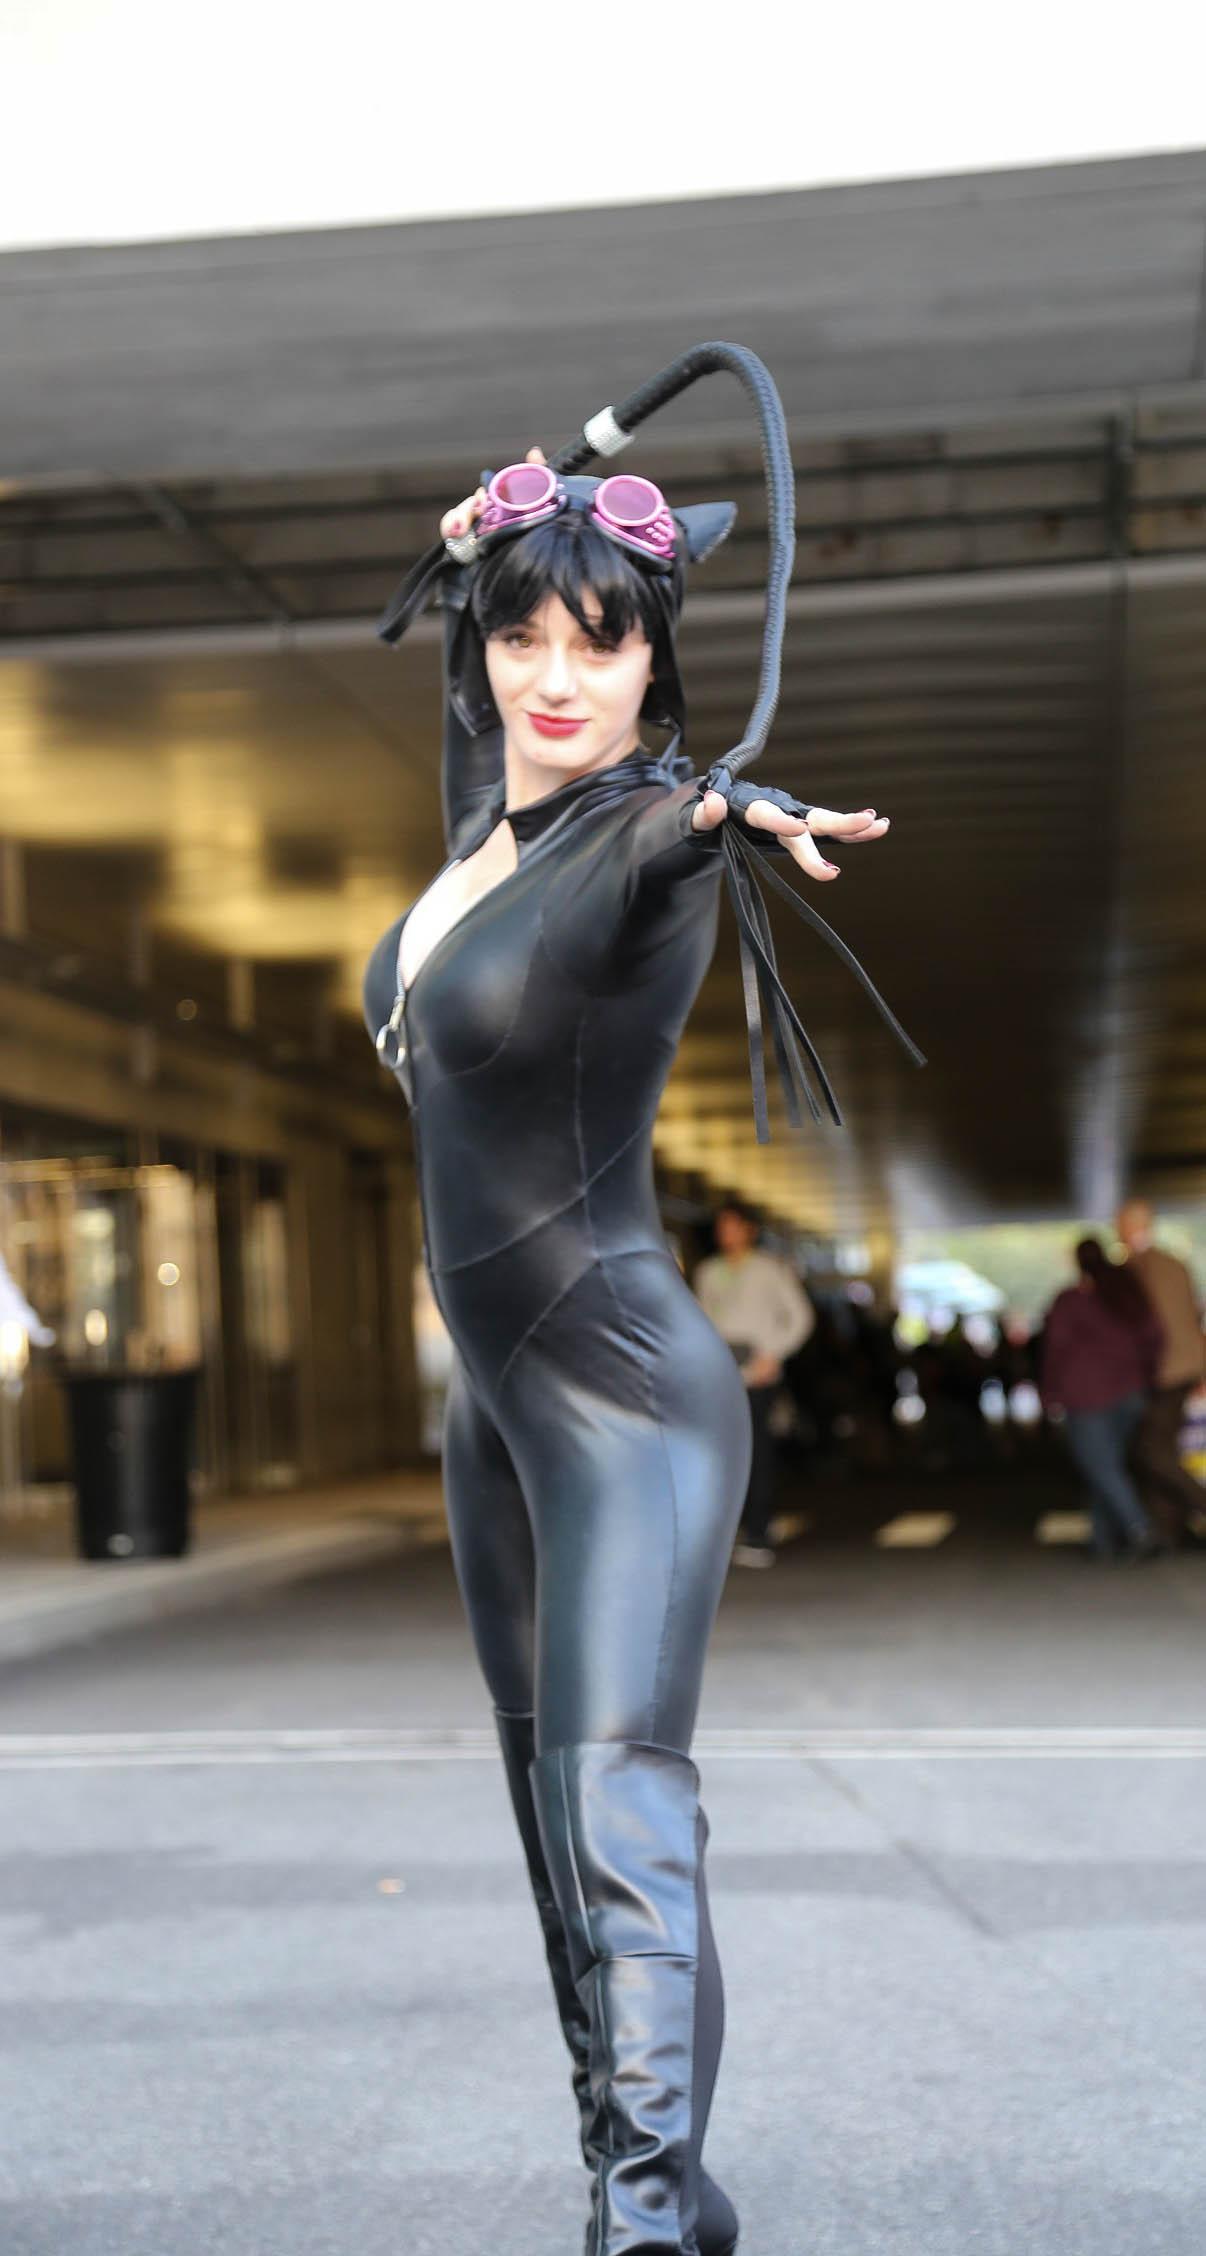 File:New York Comic Con 2015 - Catwoman (22056666921).jpg ...